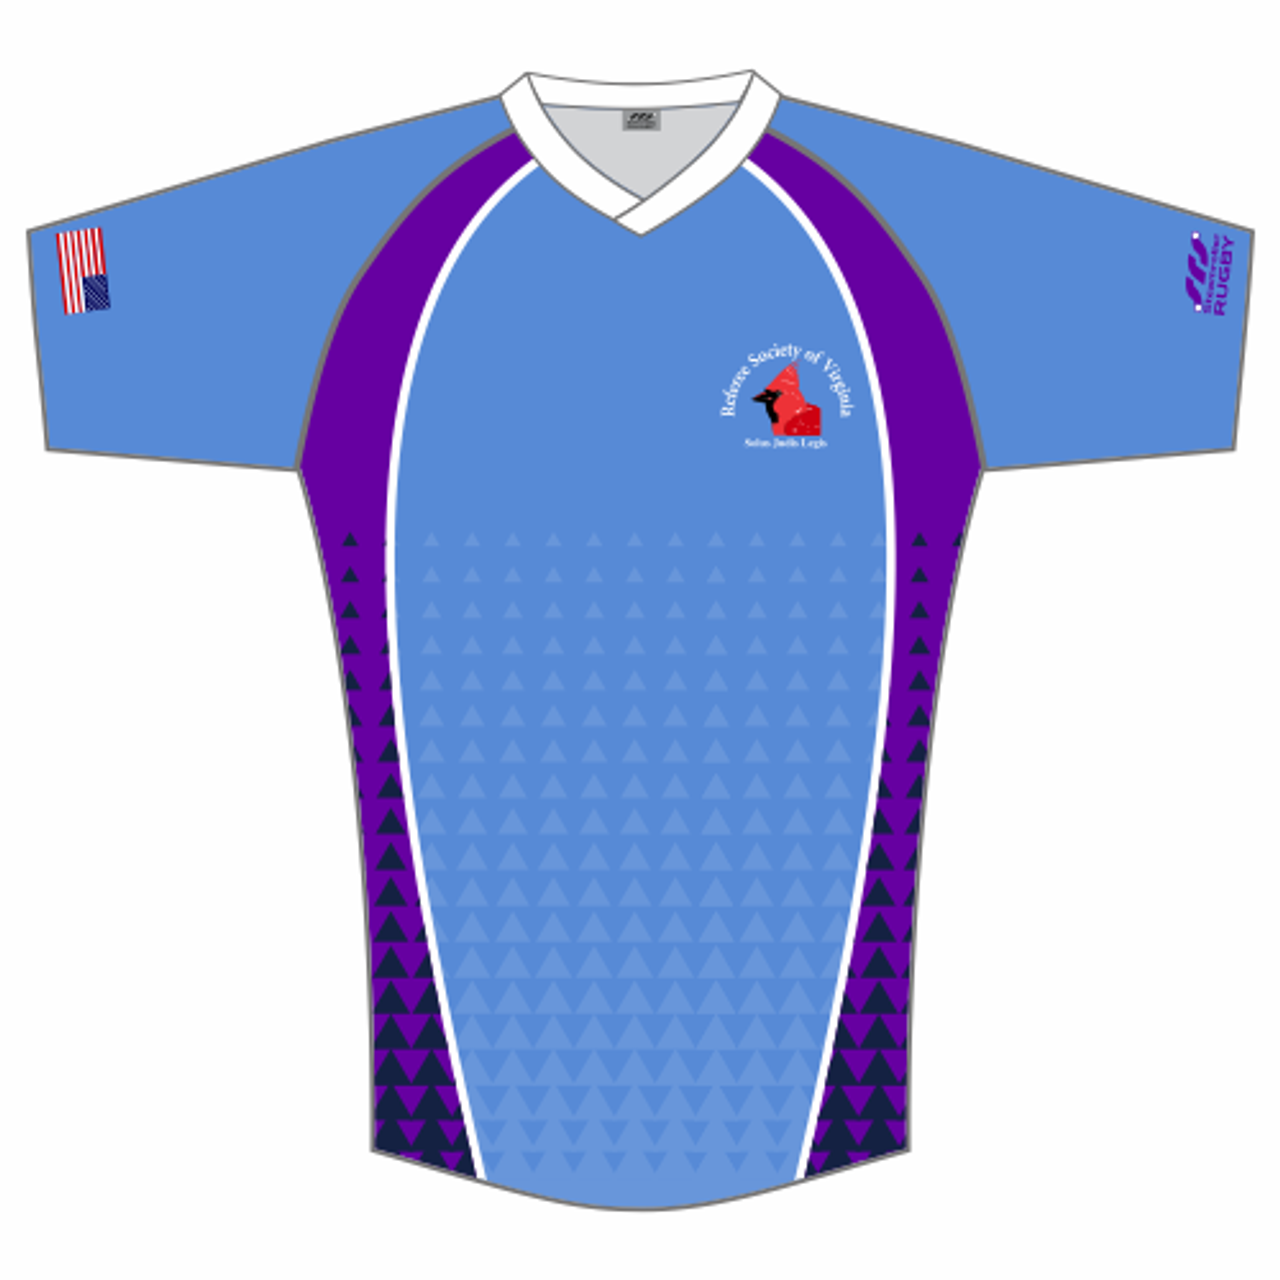 RSV 2020 Loose Fit Jersey